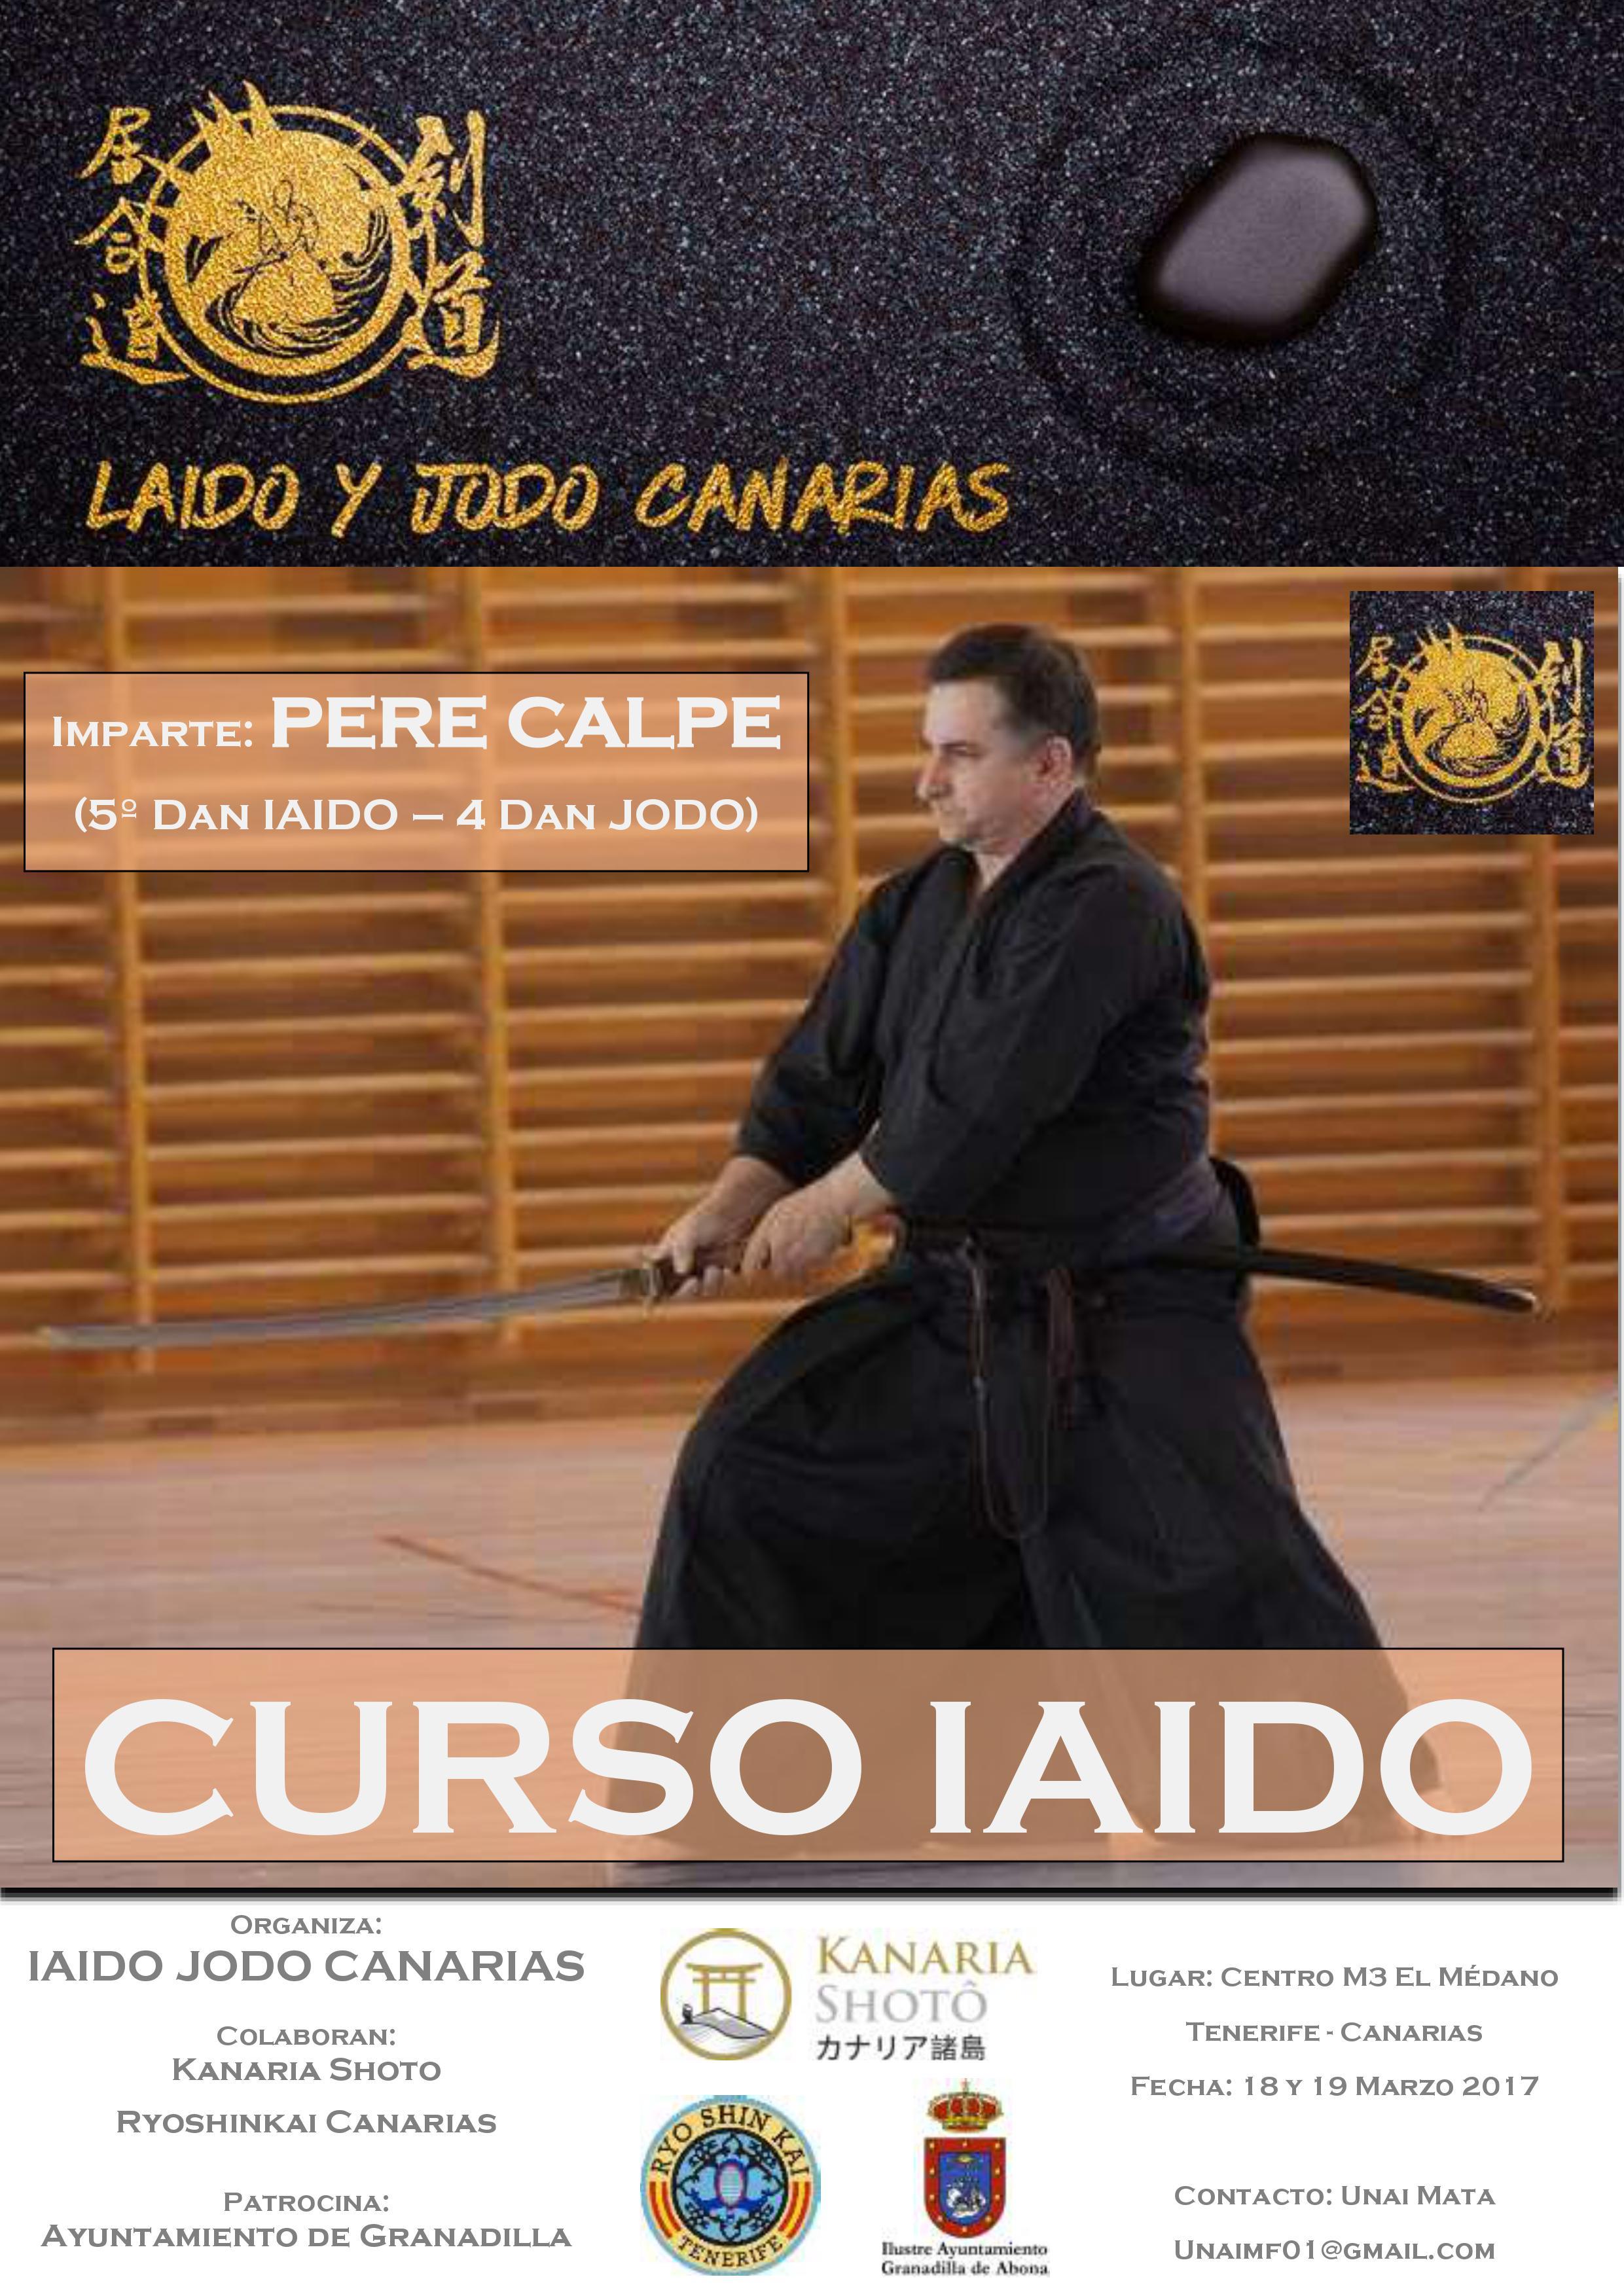 Curso Iaido Tenerife - Iaido Jodo Canarias - Pere Calpe